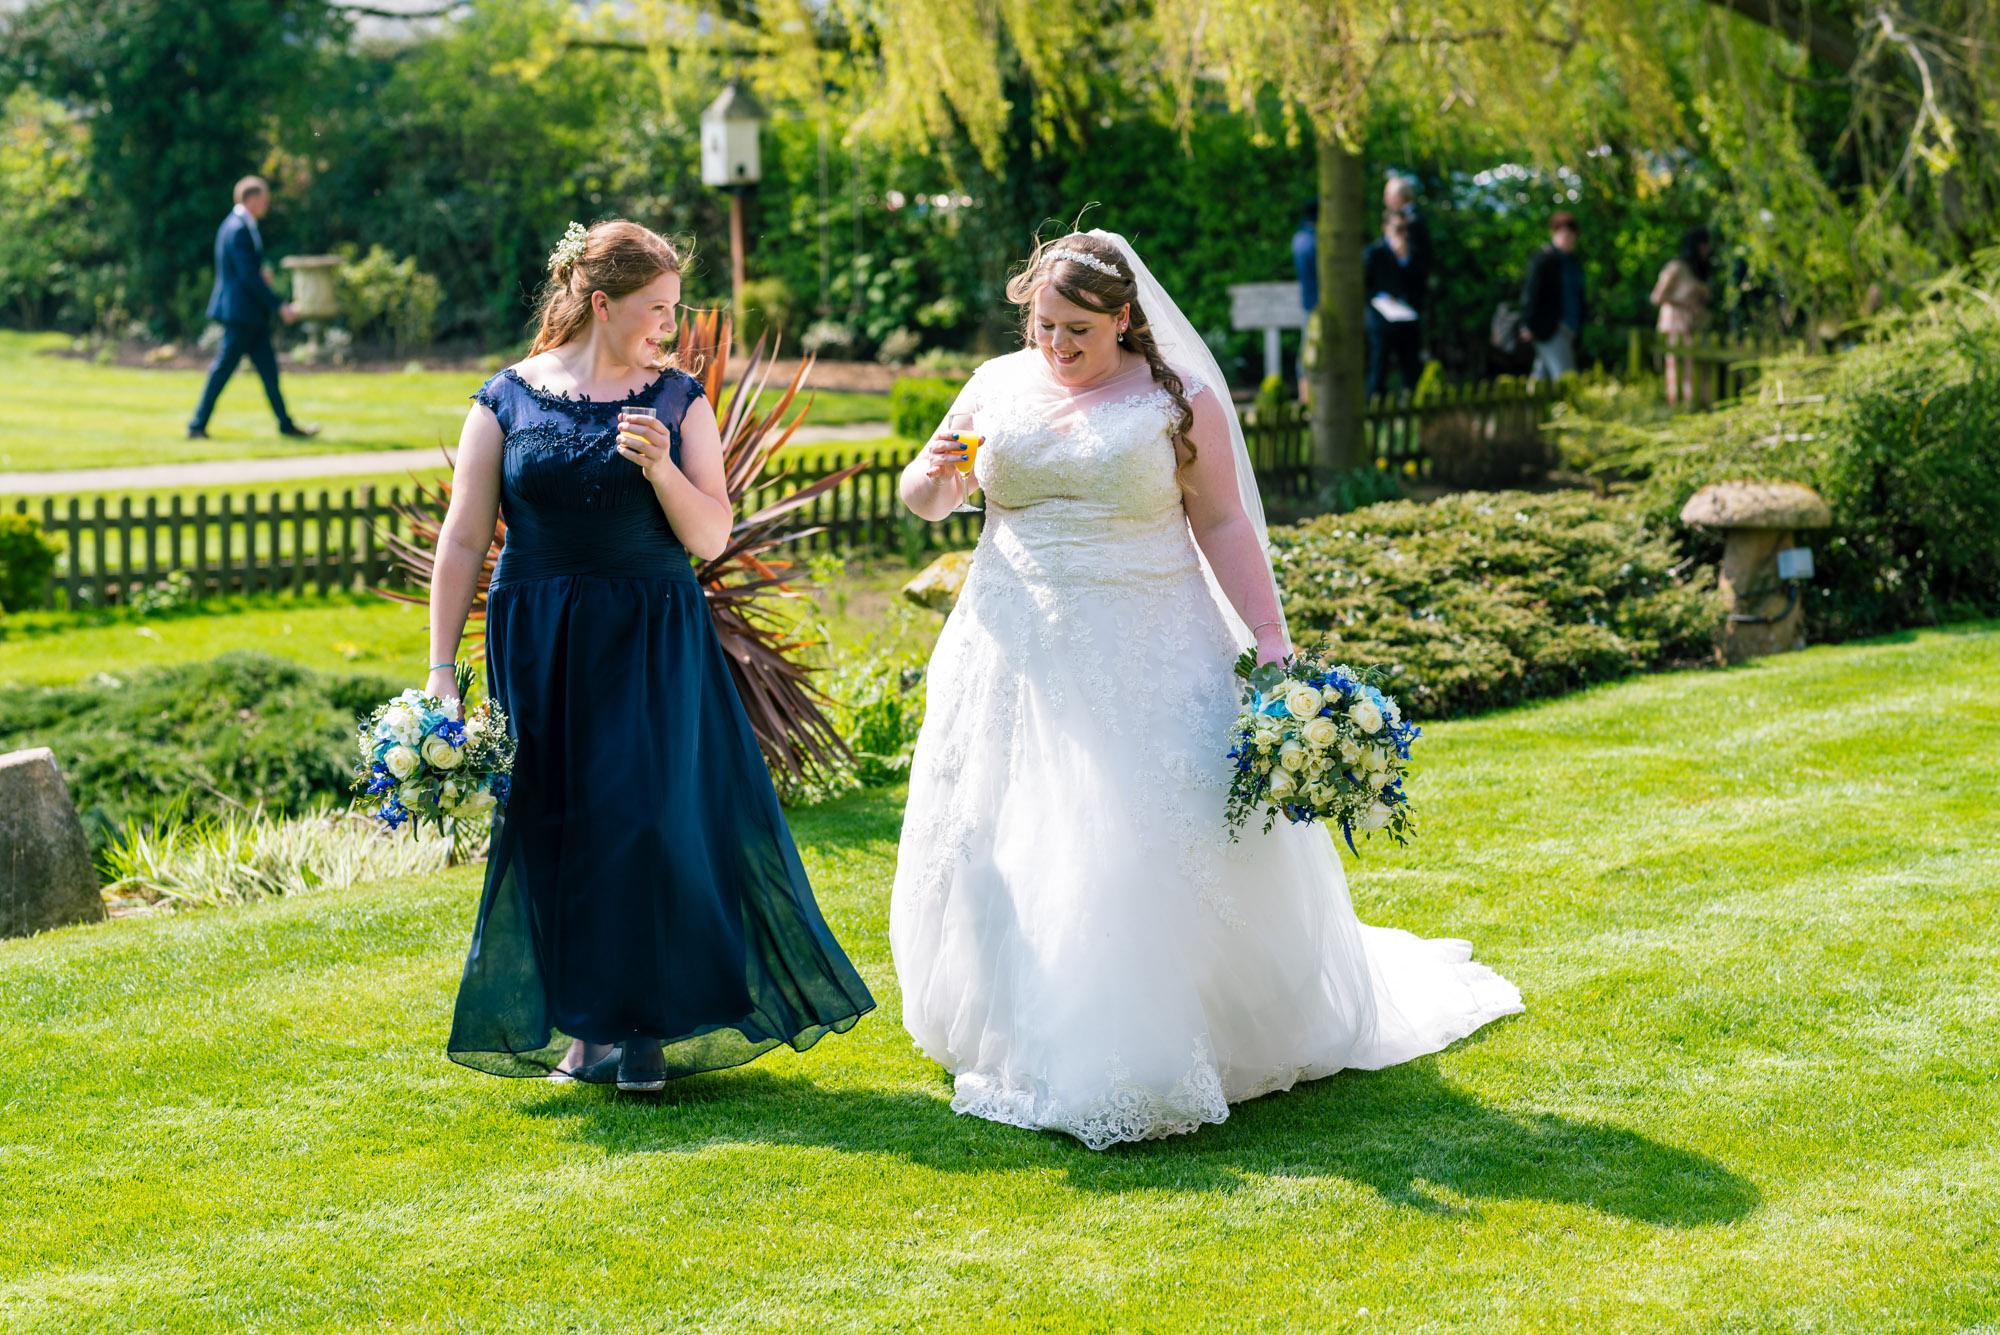 Bride and bridesmaid walk across the lawn